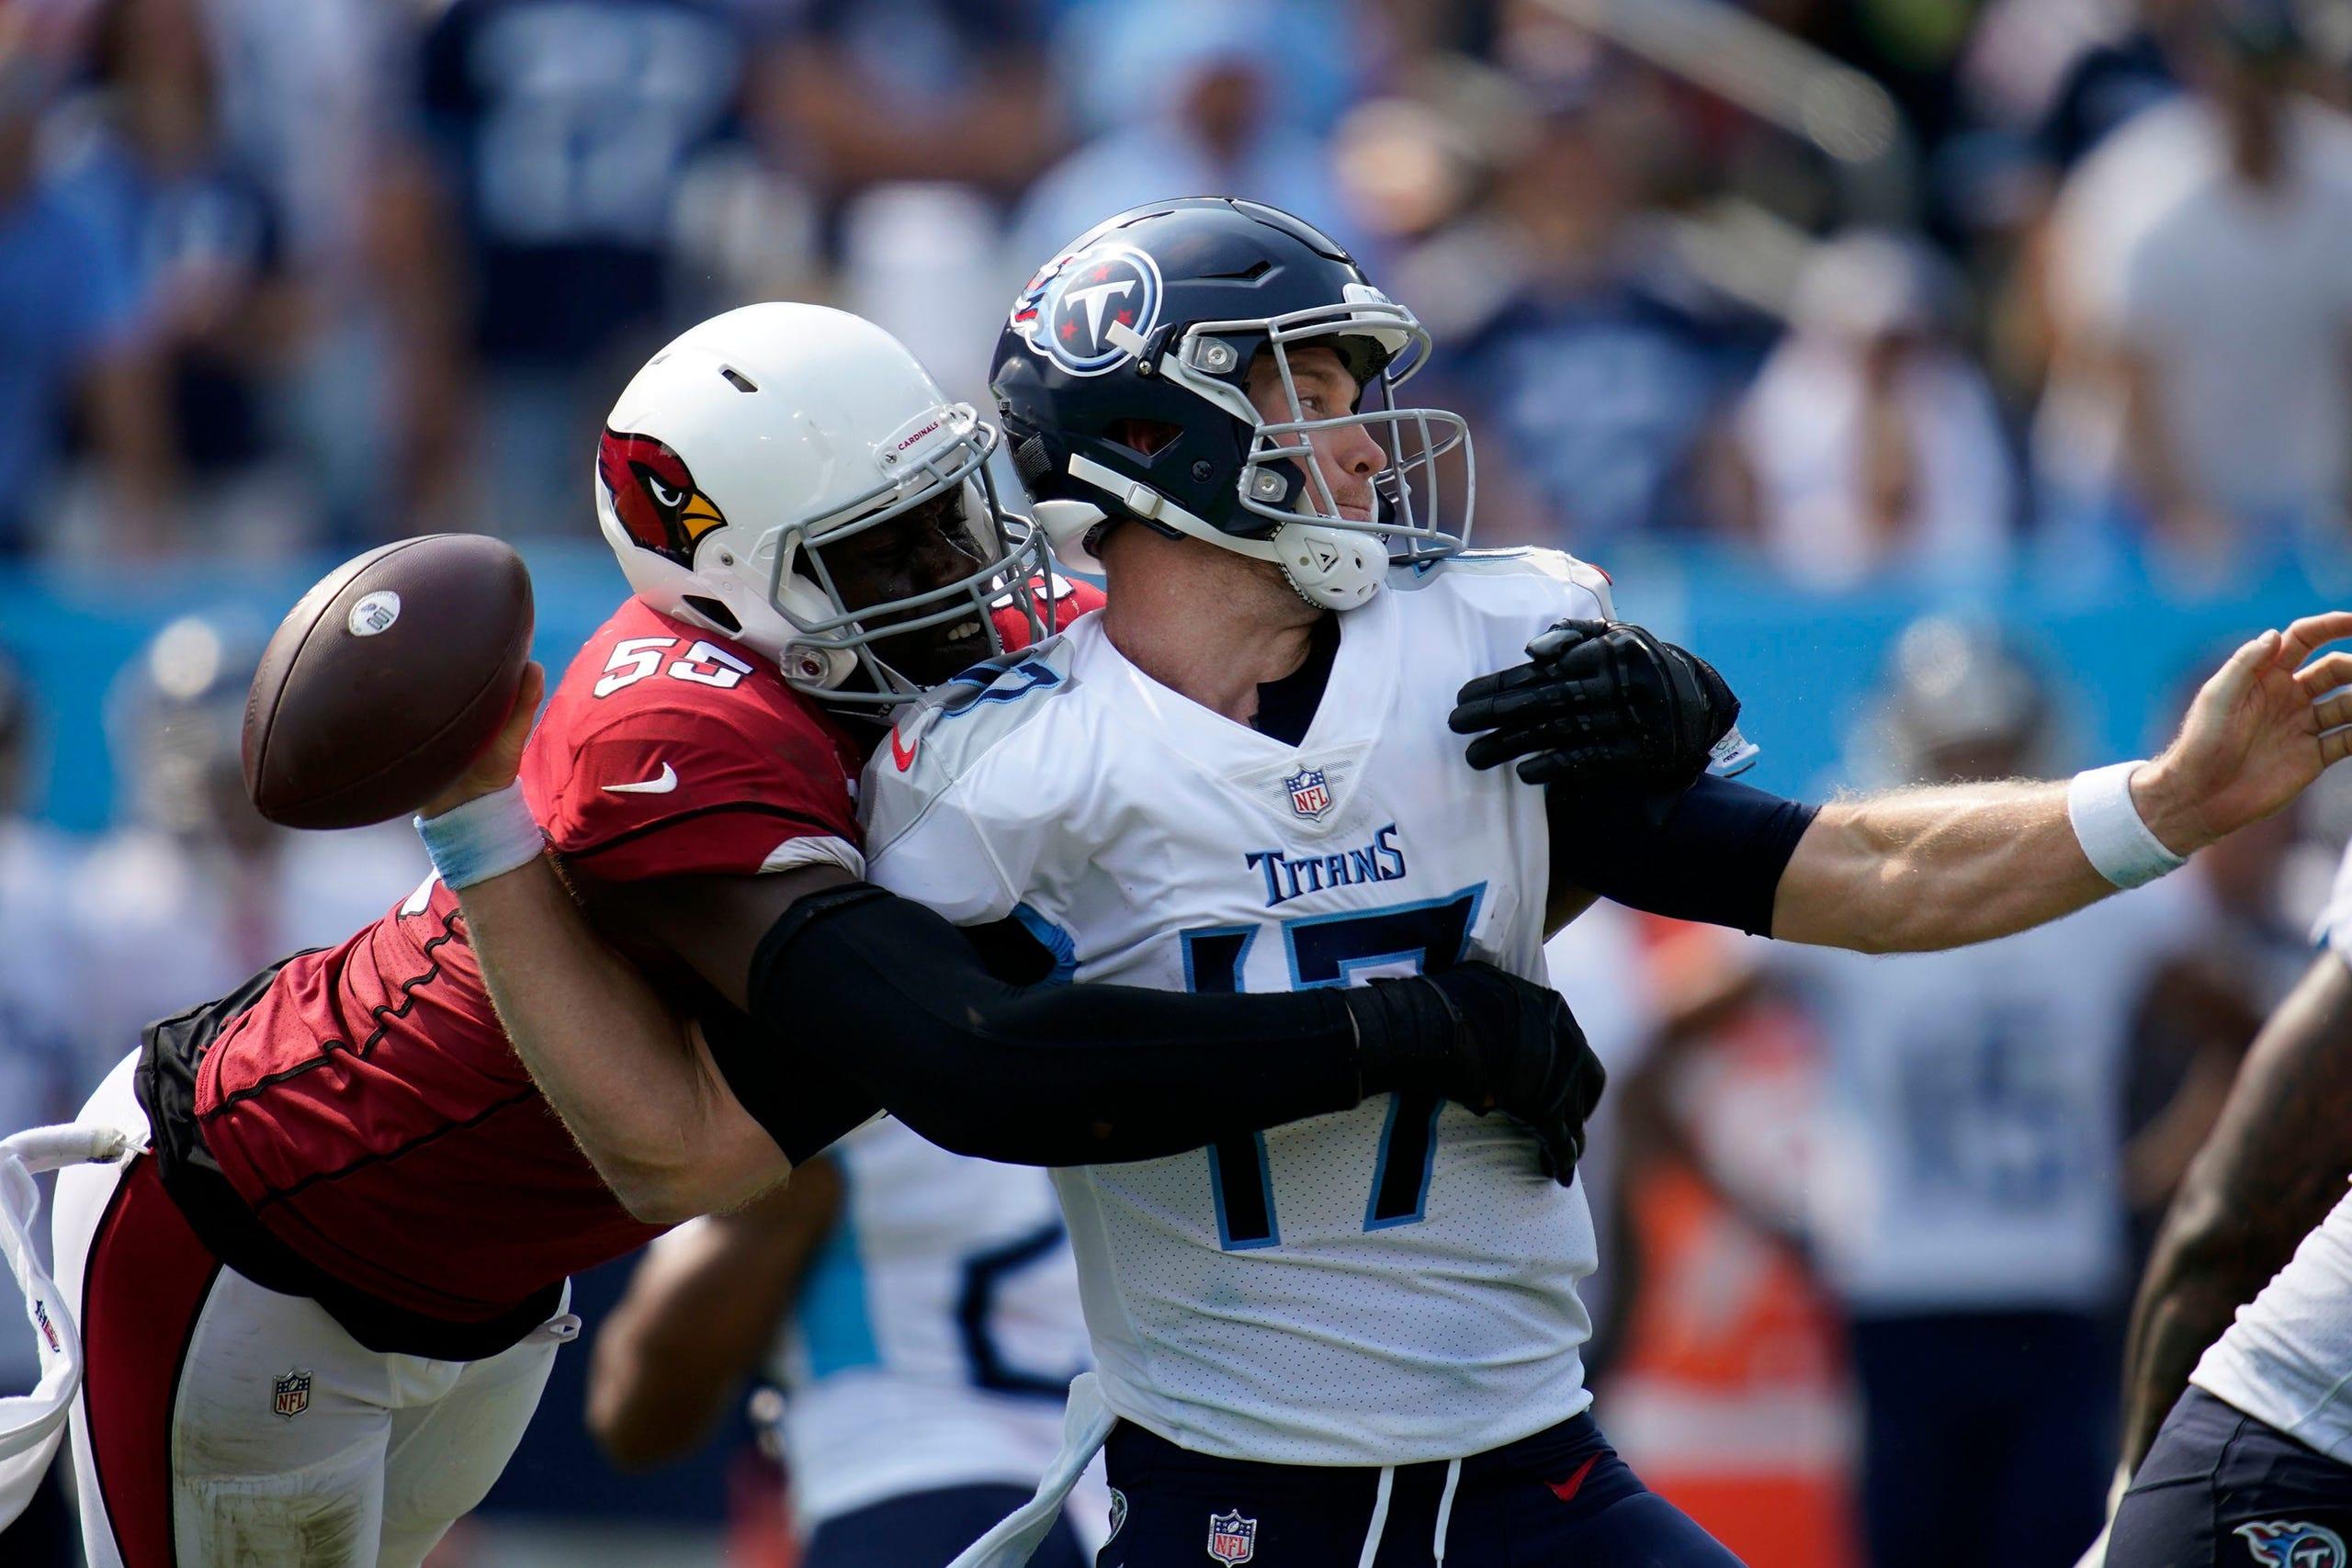 Tennessee Titans quarterback Ryan Tannehill (17) is sacked by Arizona Cardinals linebacker Chandler Jones (55) during the third quarter at Nissan Stadium Sunday, Sept. 12, 2021 in Nashville, Tenn.  Titans Cards 190